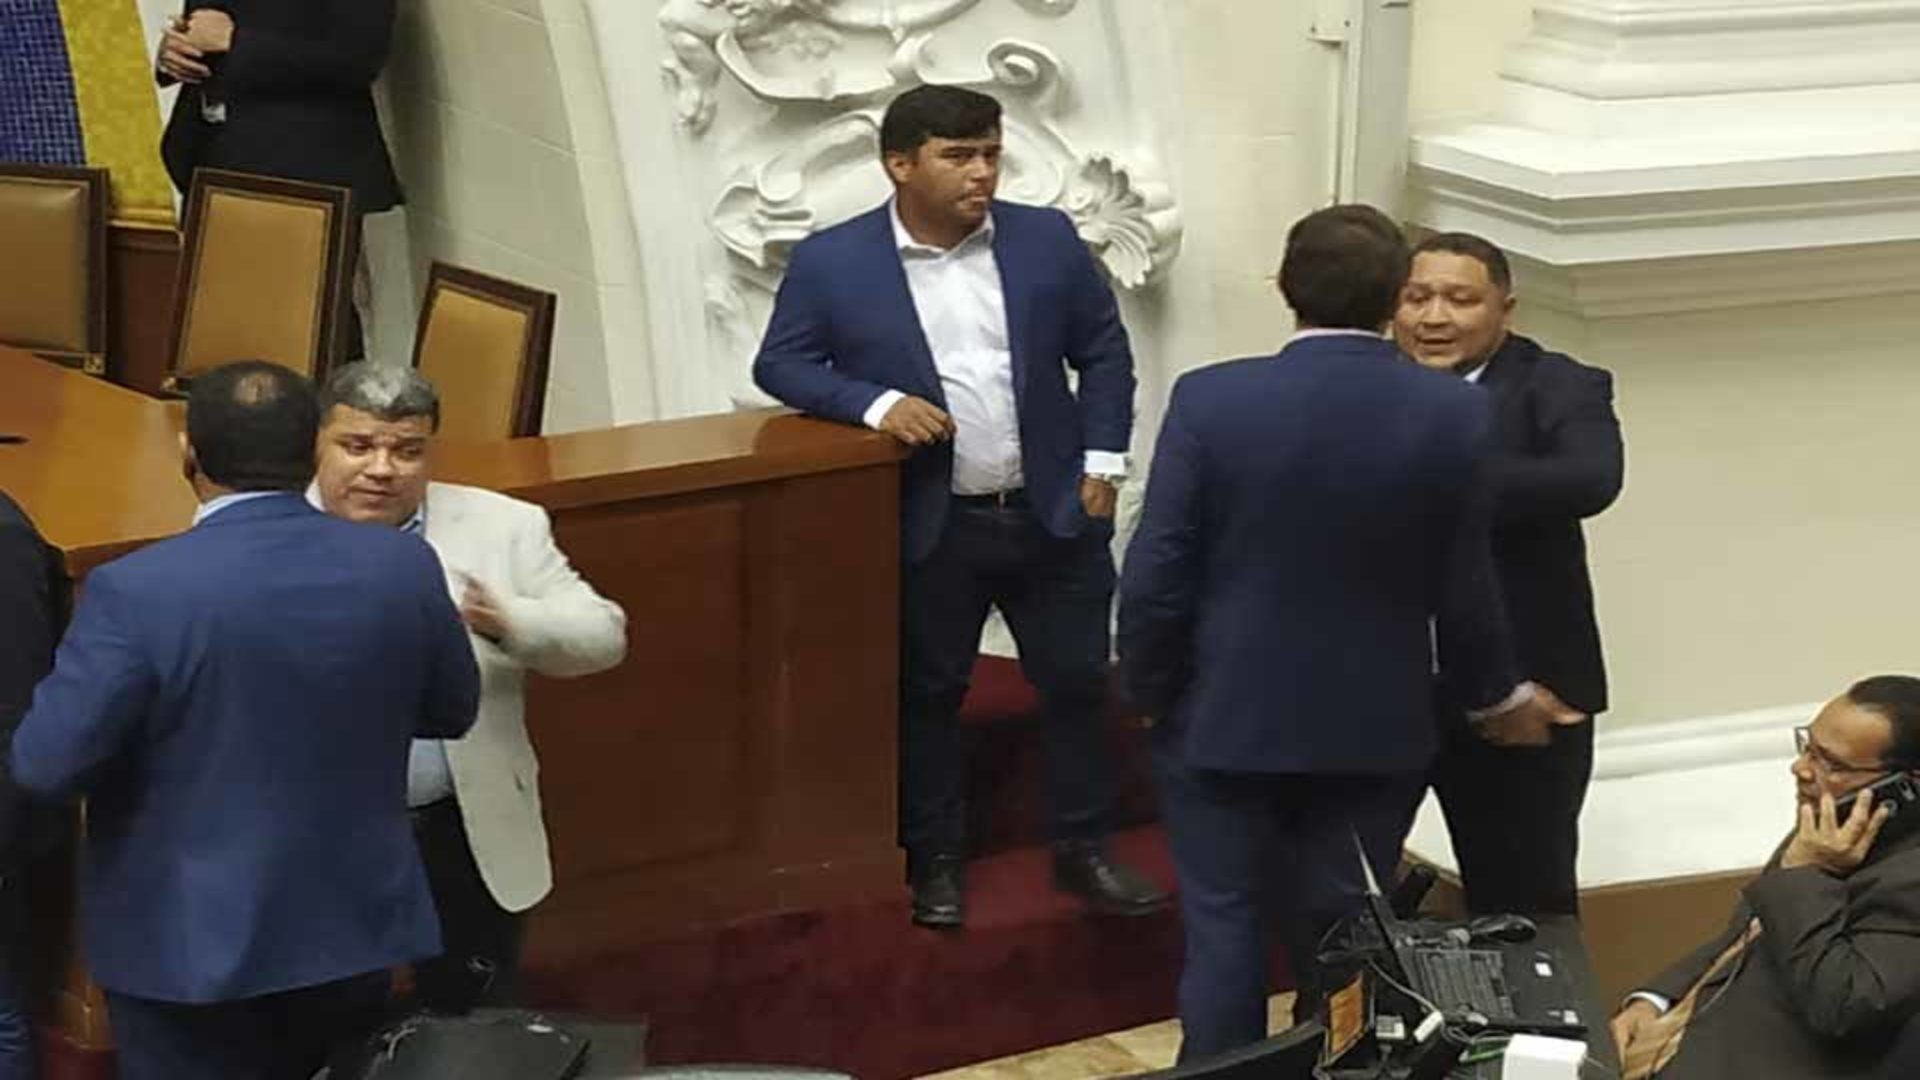 Régimen desembolsó más de 50 millones de euros por la «operación Alacrán»